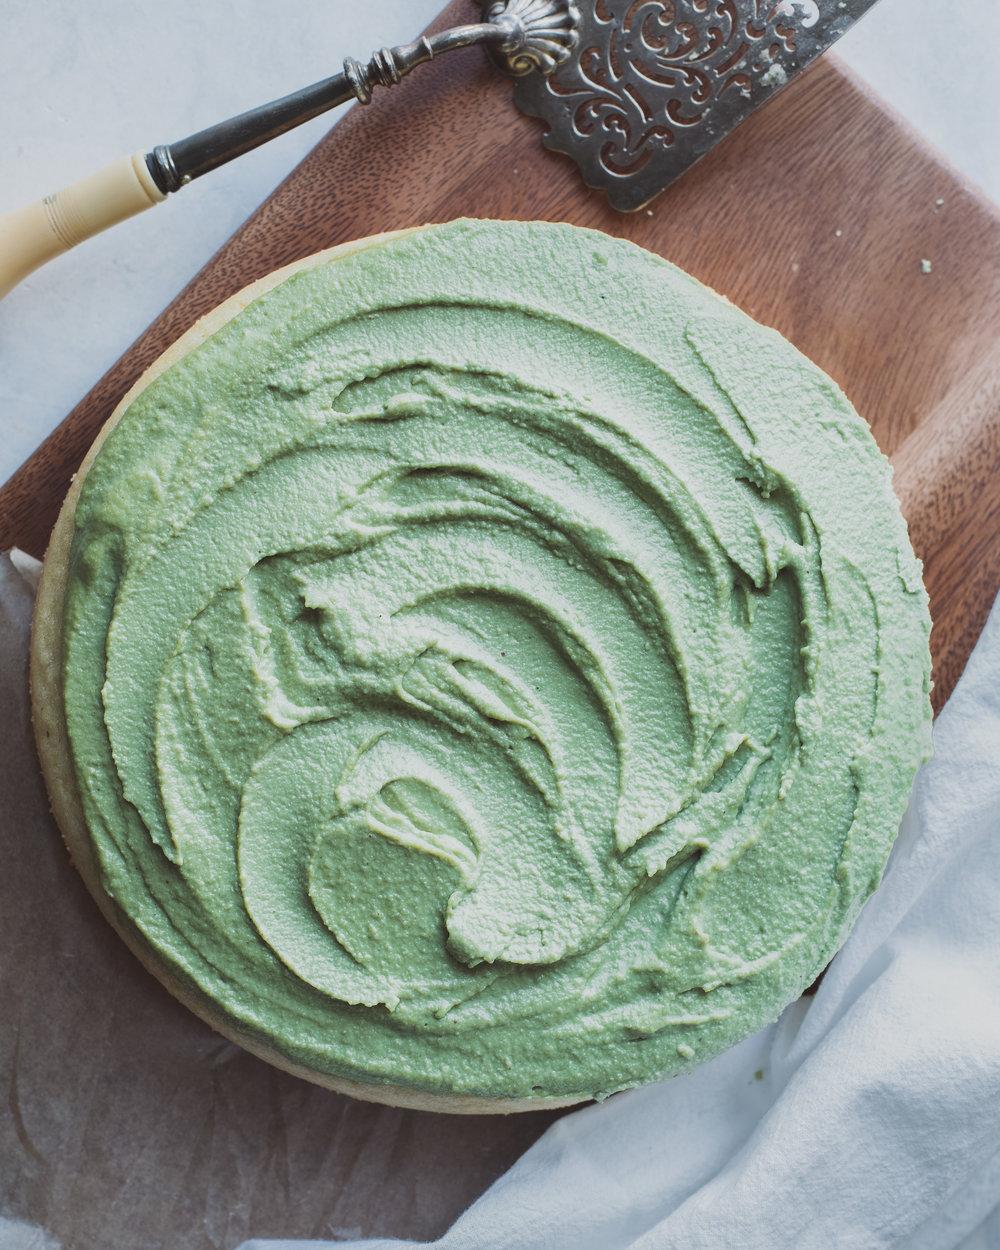 Lemon Cake with Matcha Frosting - V, GF